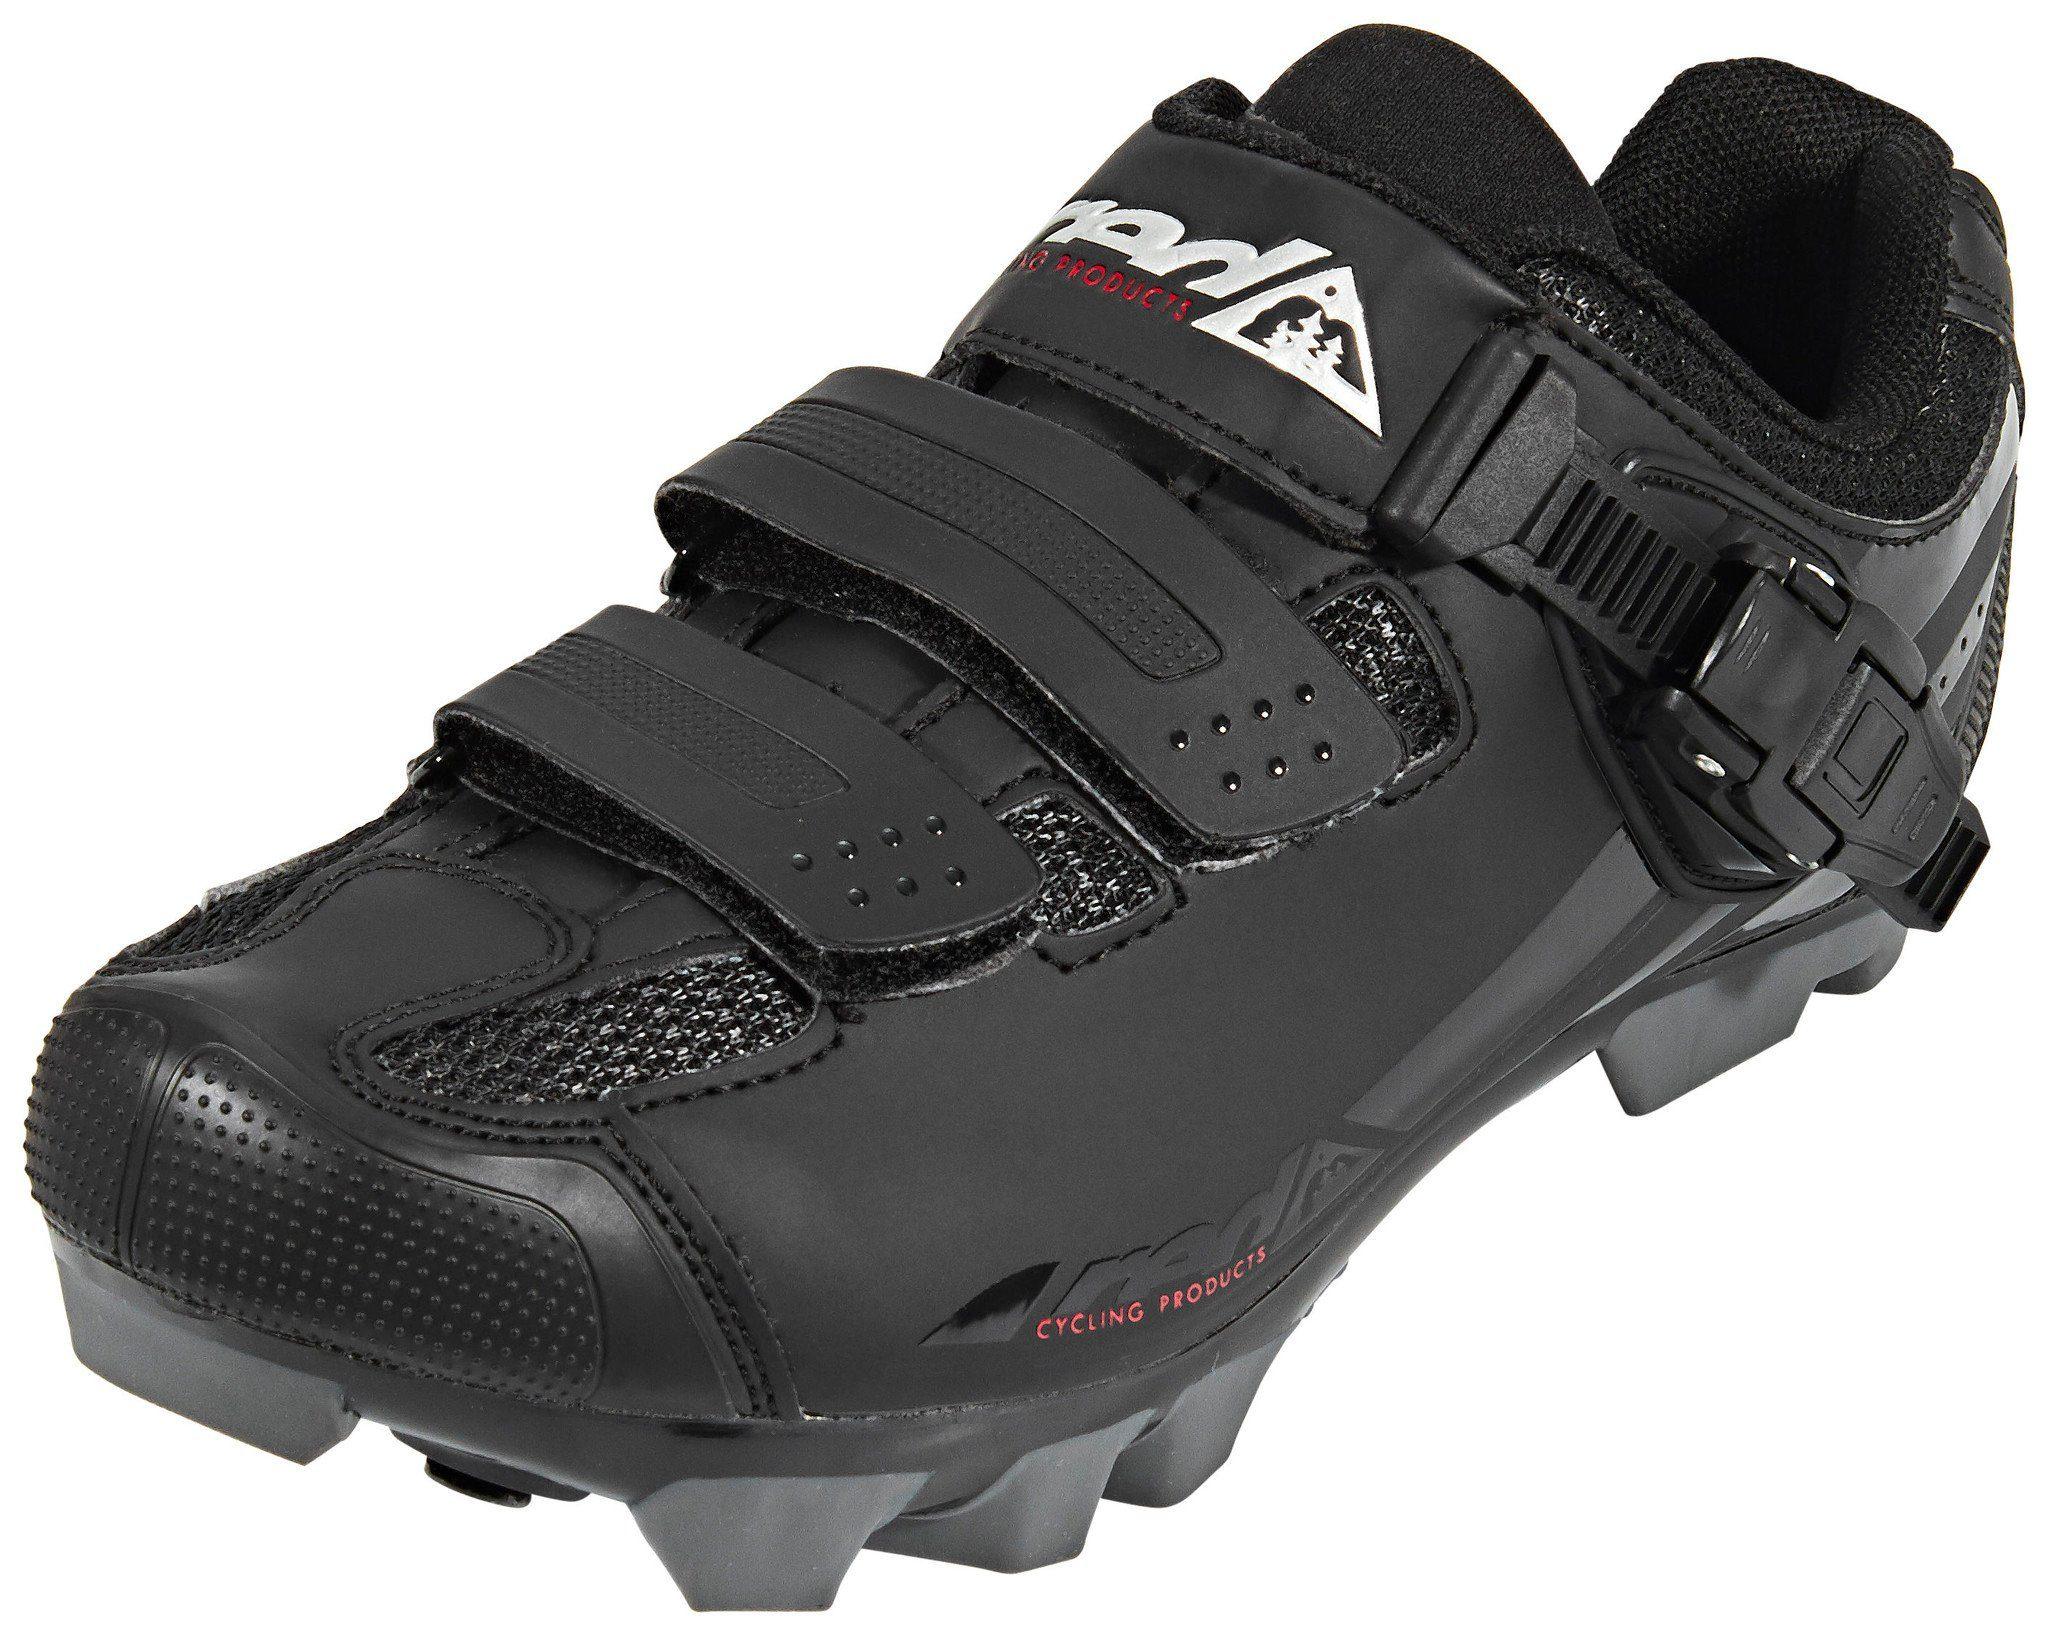 Red Cycling Products Fahrradschuhe Mountain III Unisex MTB Schuhe online kaufen  schwarz